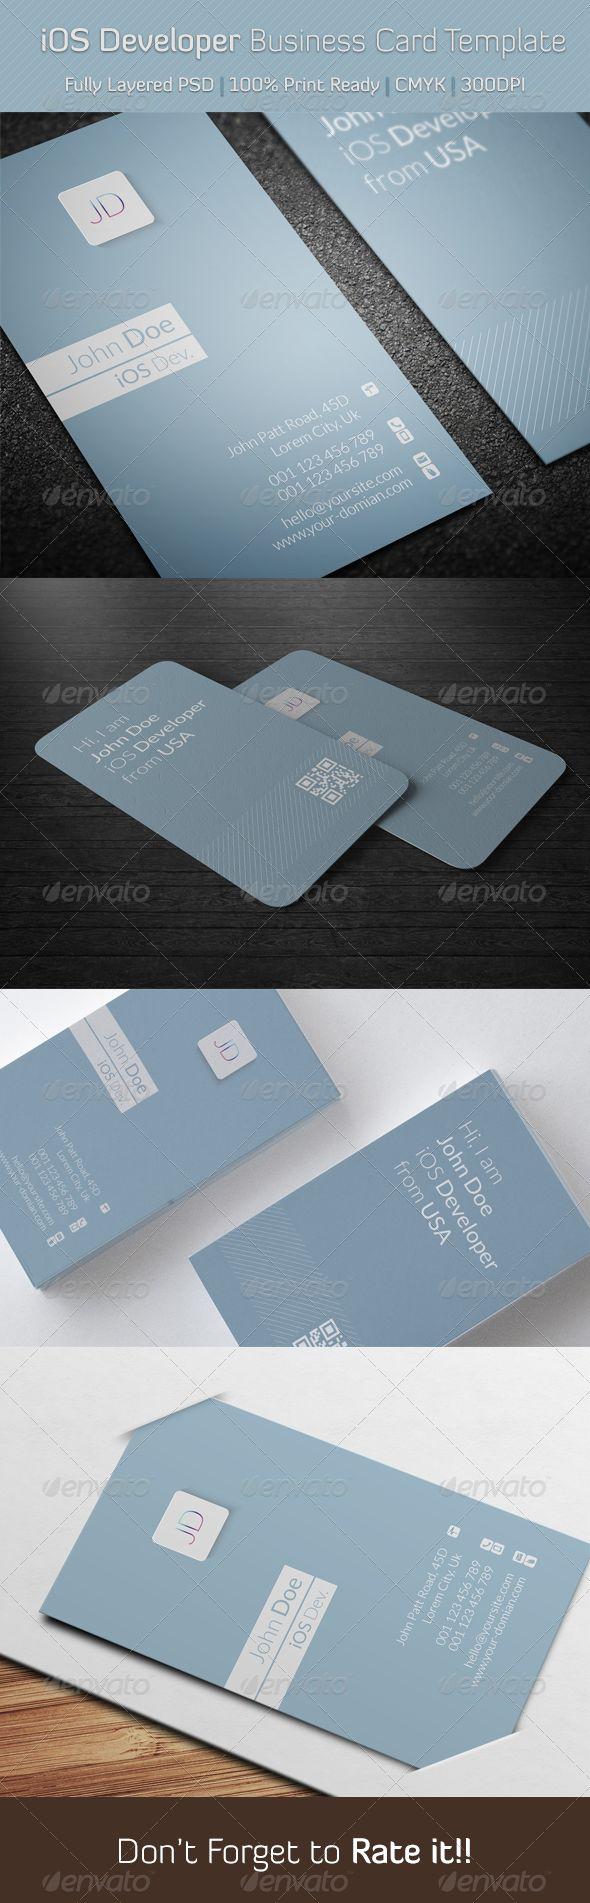 iOS Developer Business Card Template  #GraphicRiver